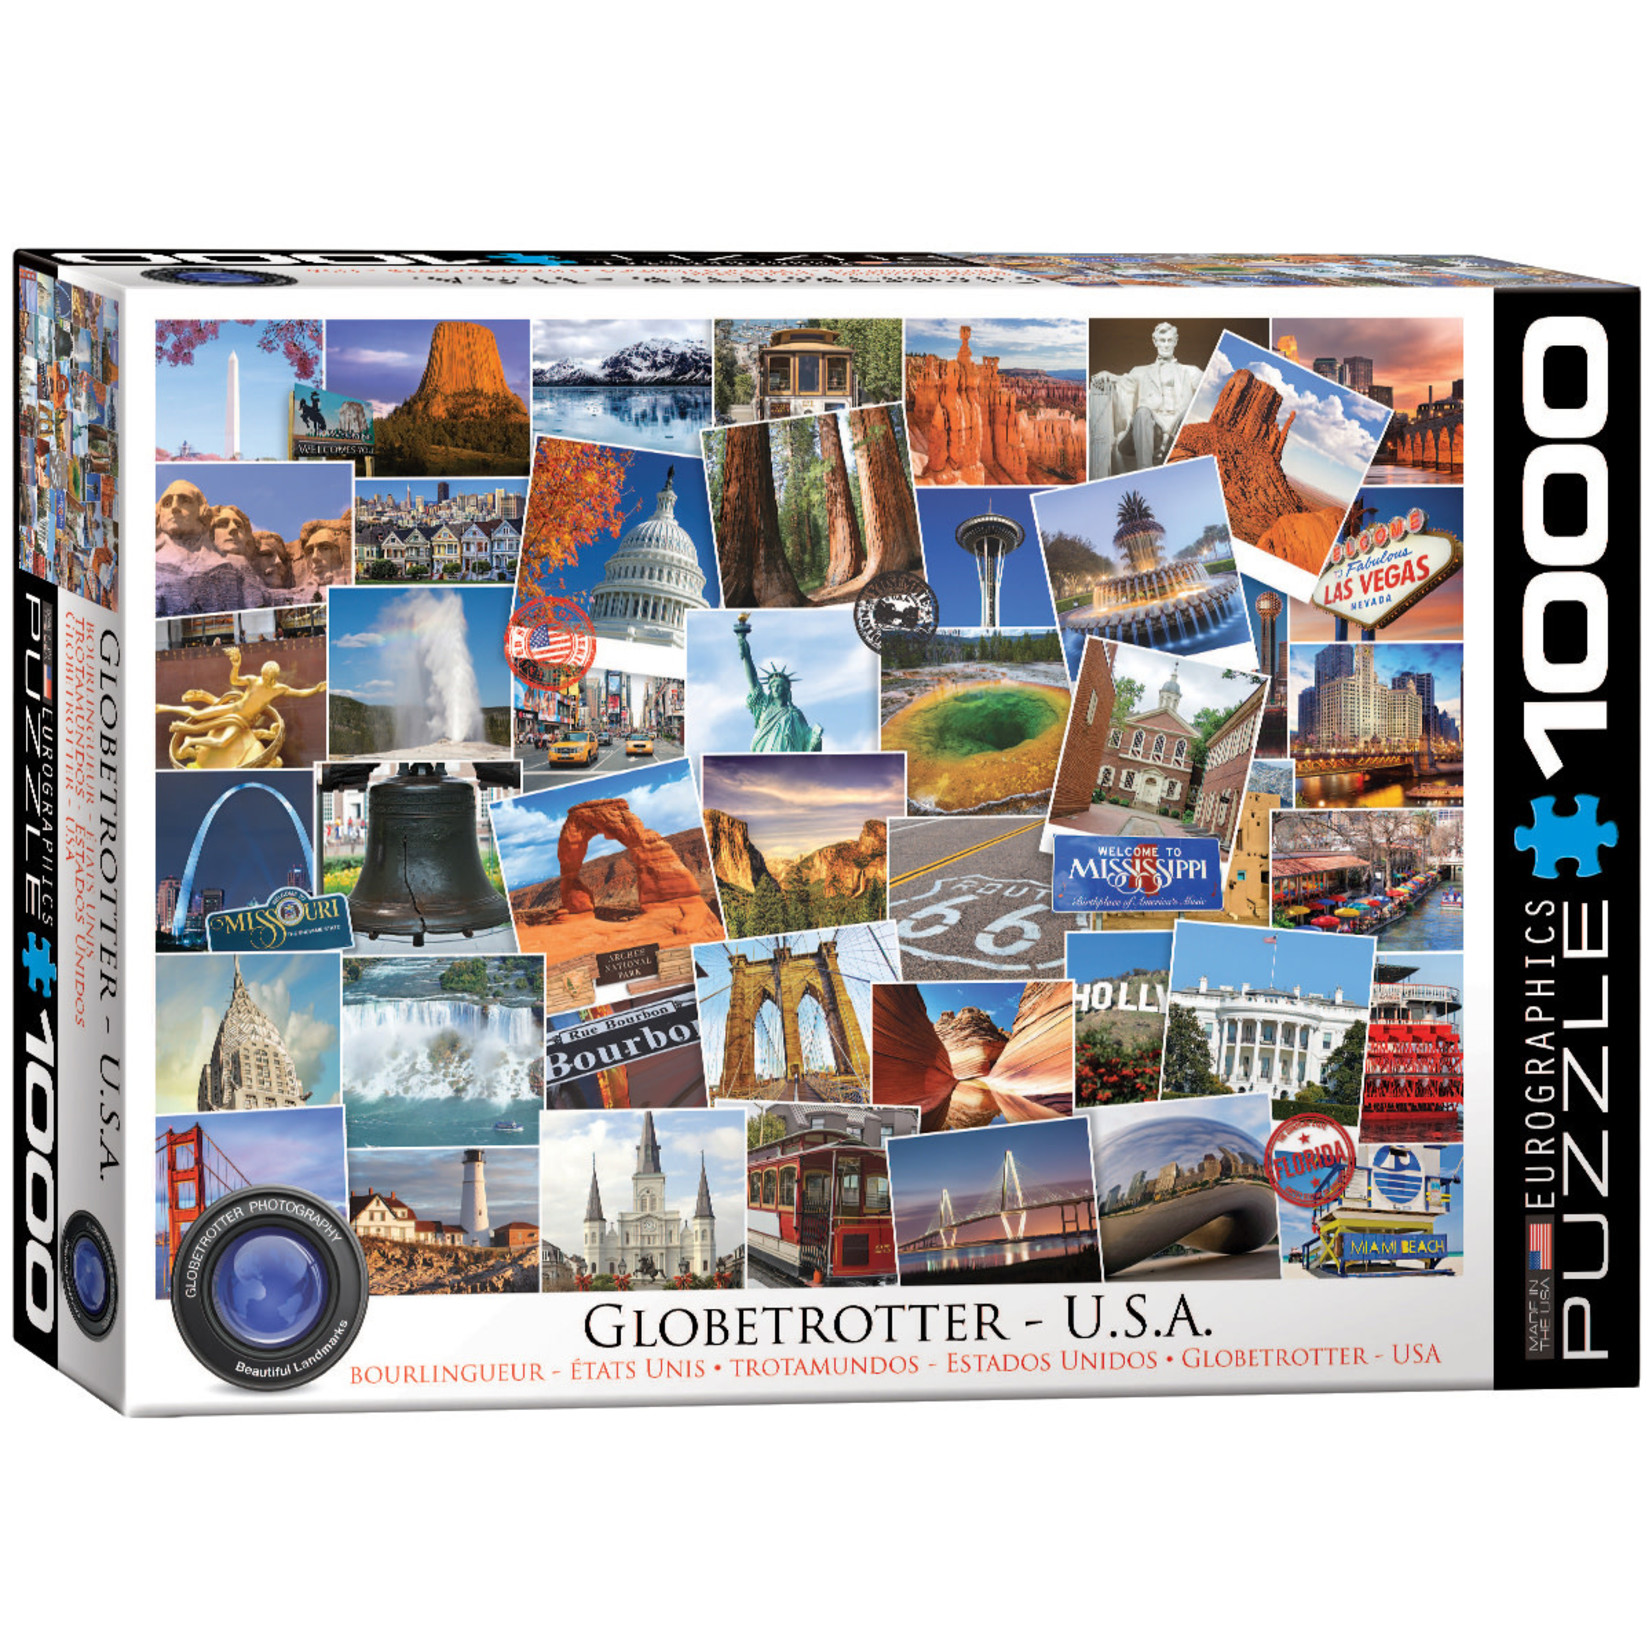 Eurographics Puzzles Globetrotter USA 1000pc